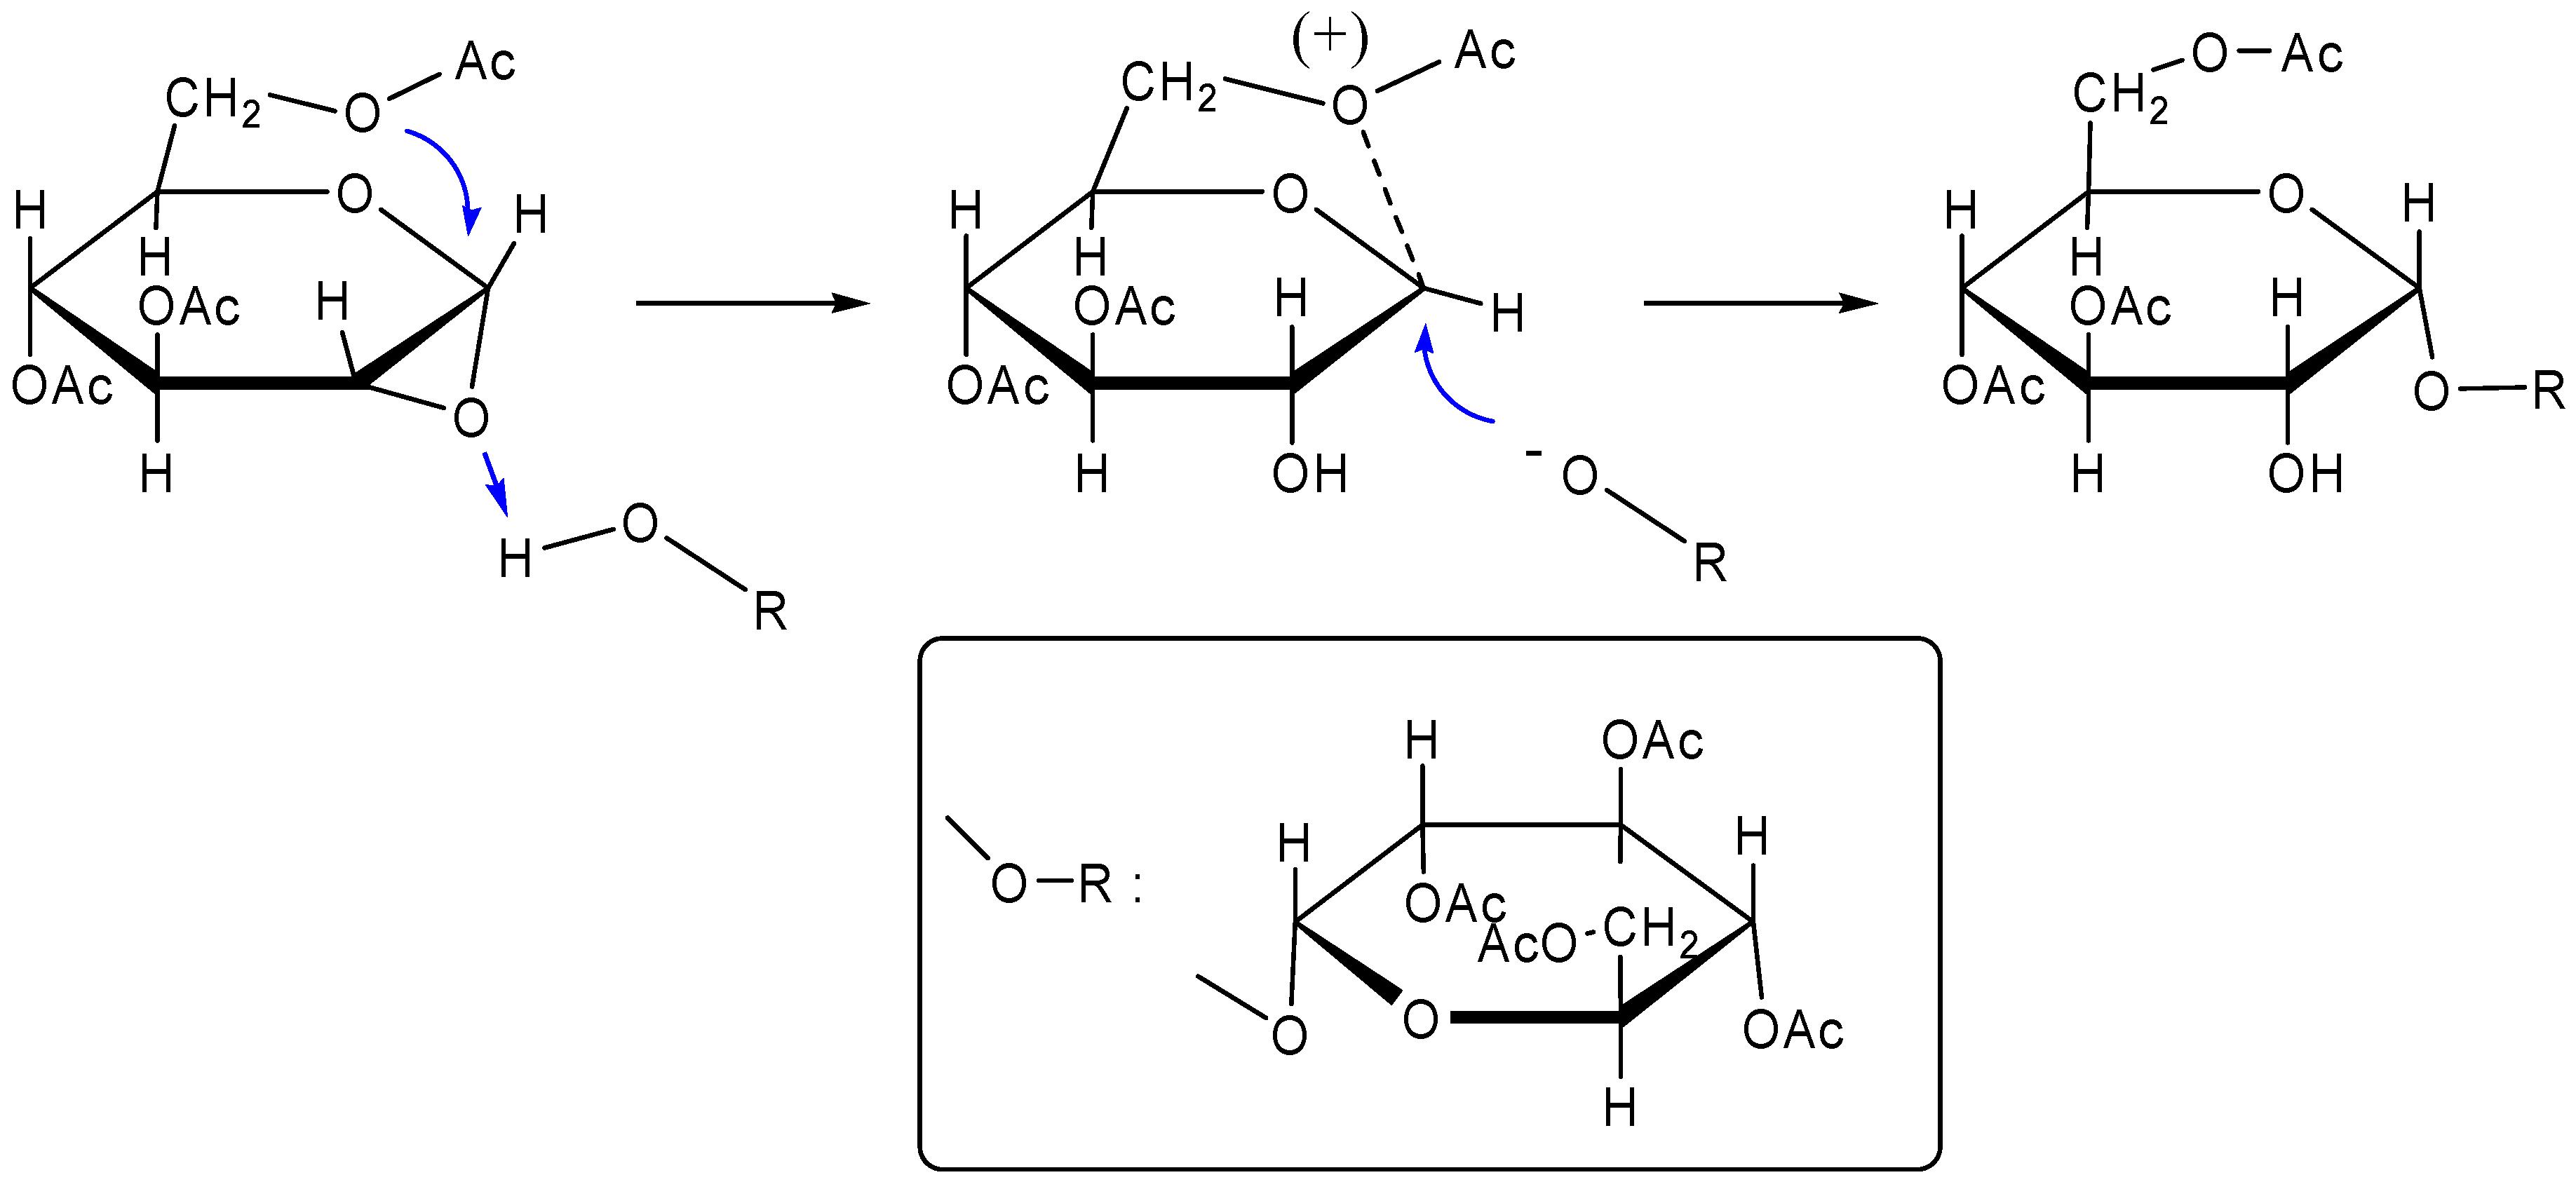 Molecules | Free Full-Text | Trehalose and Trehalose-based